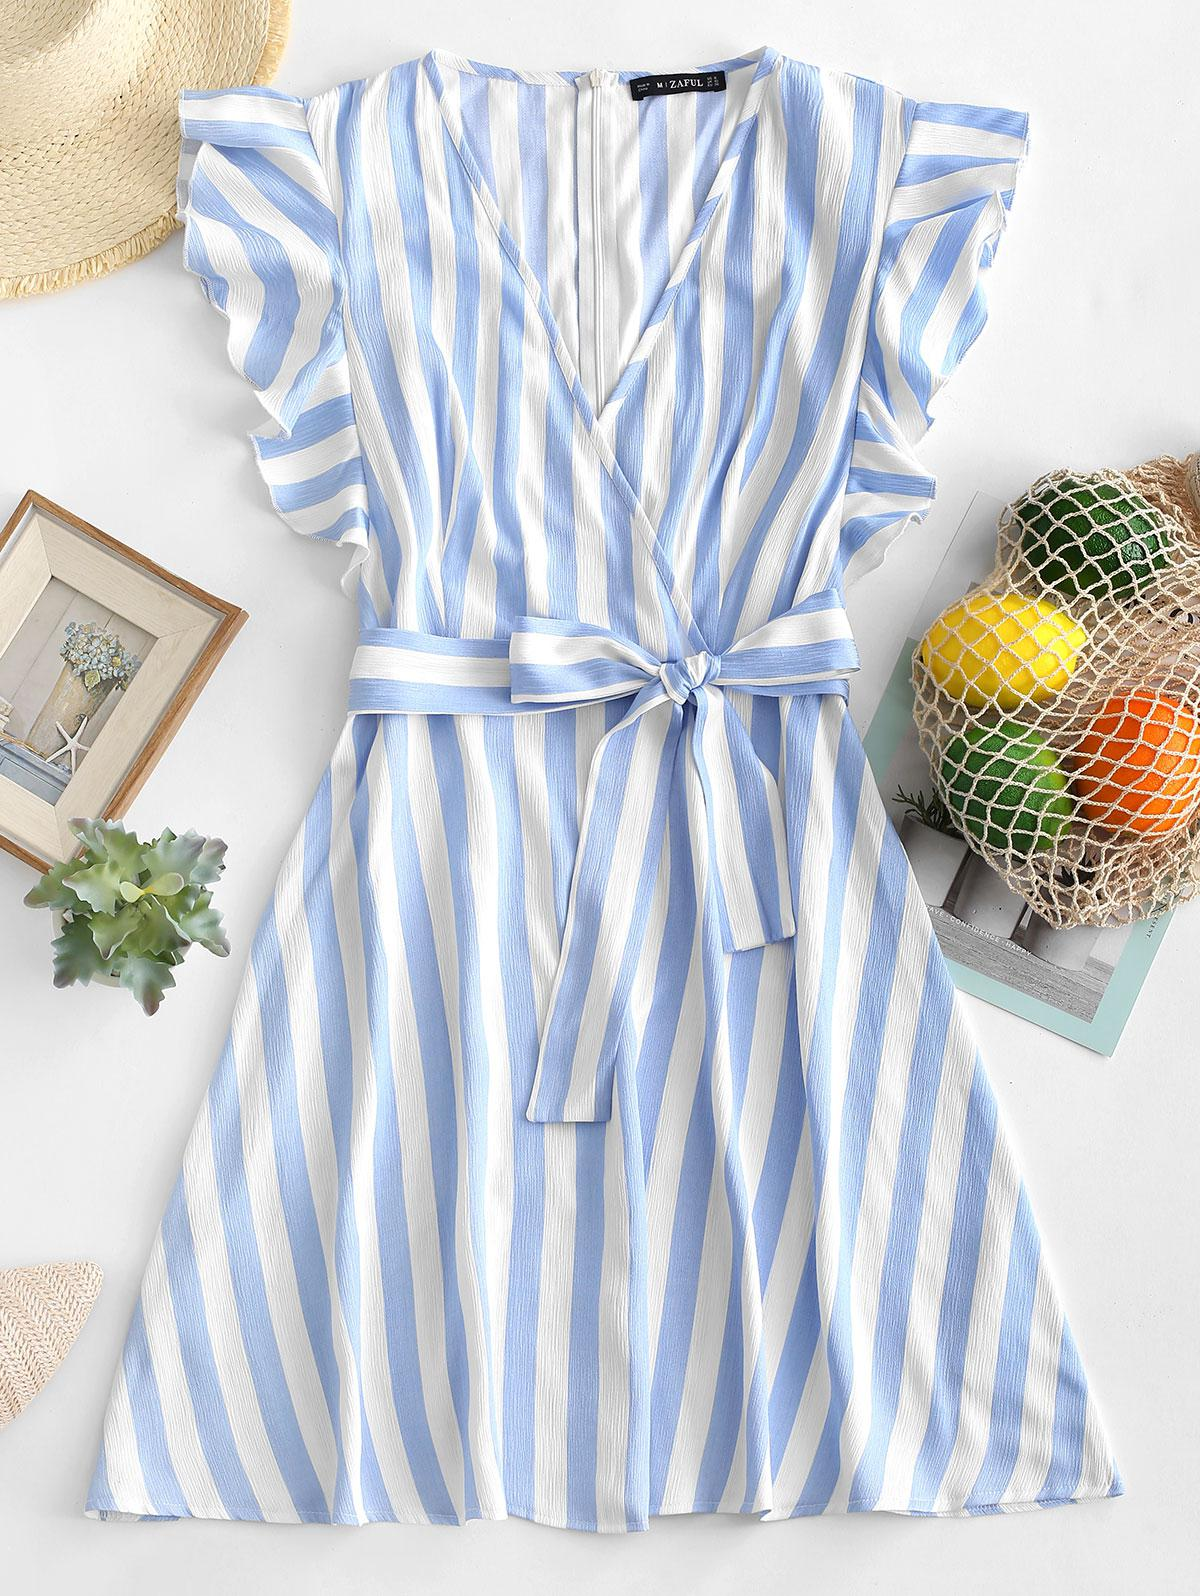 ZAFUL Striped Surplice Ruffled Belted Dress, Blue